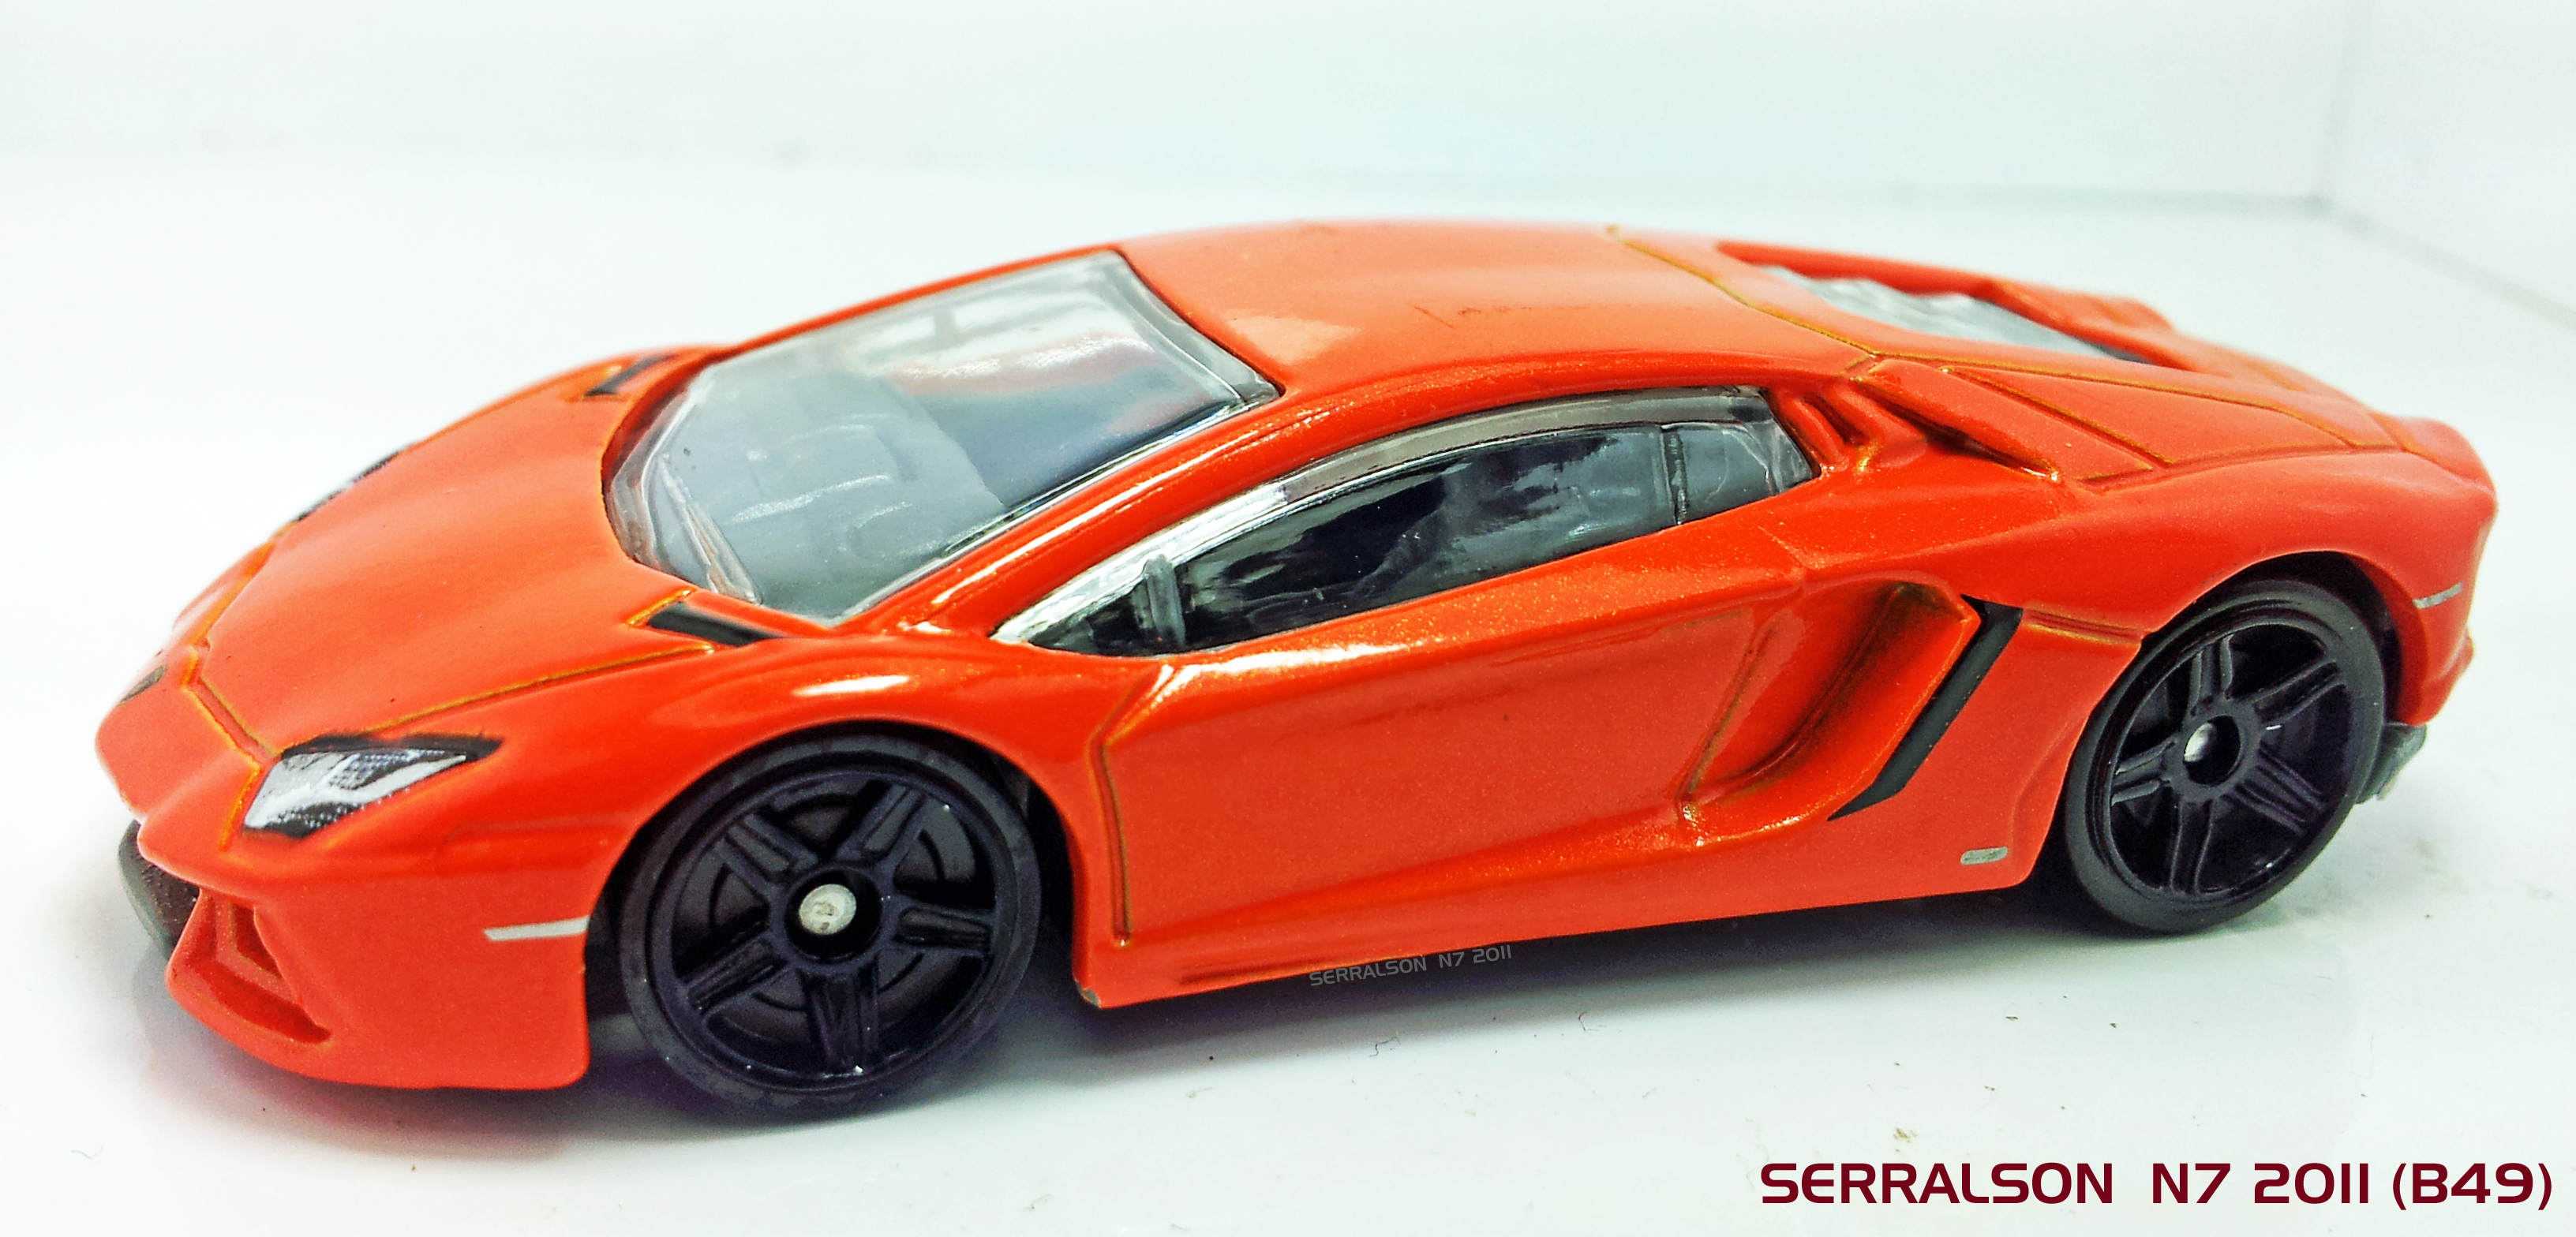 Lamborghini | Hot Wheels Wiki | FANDOM powered by Wikia